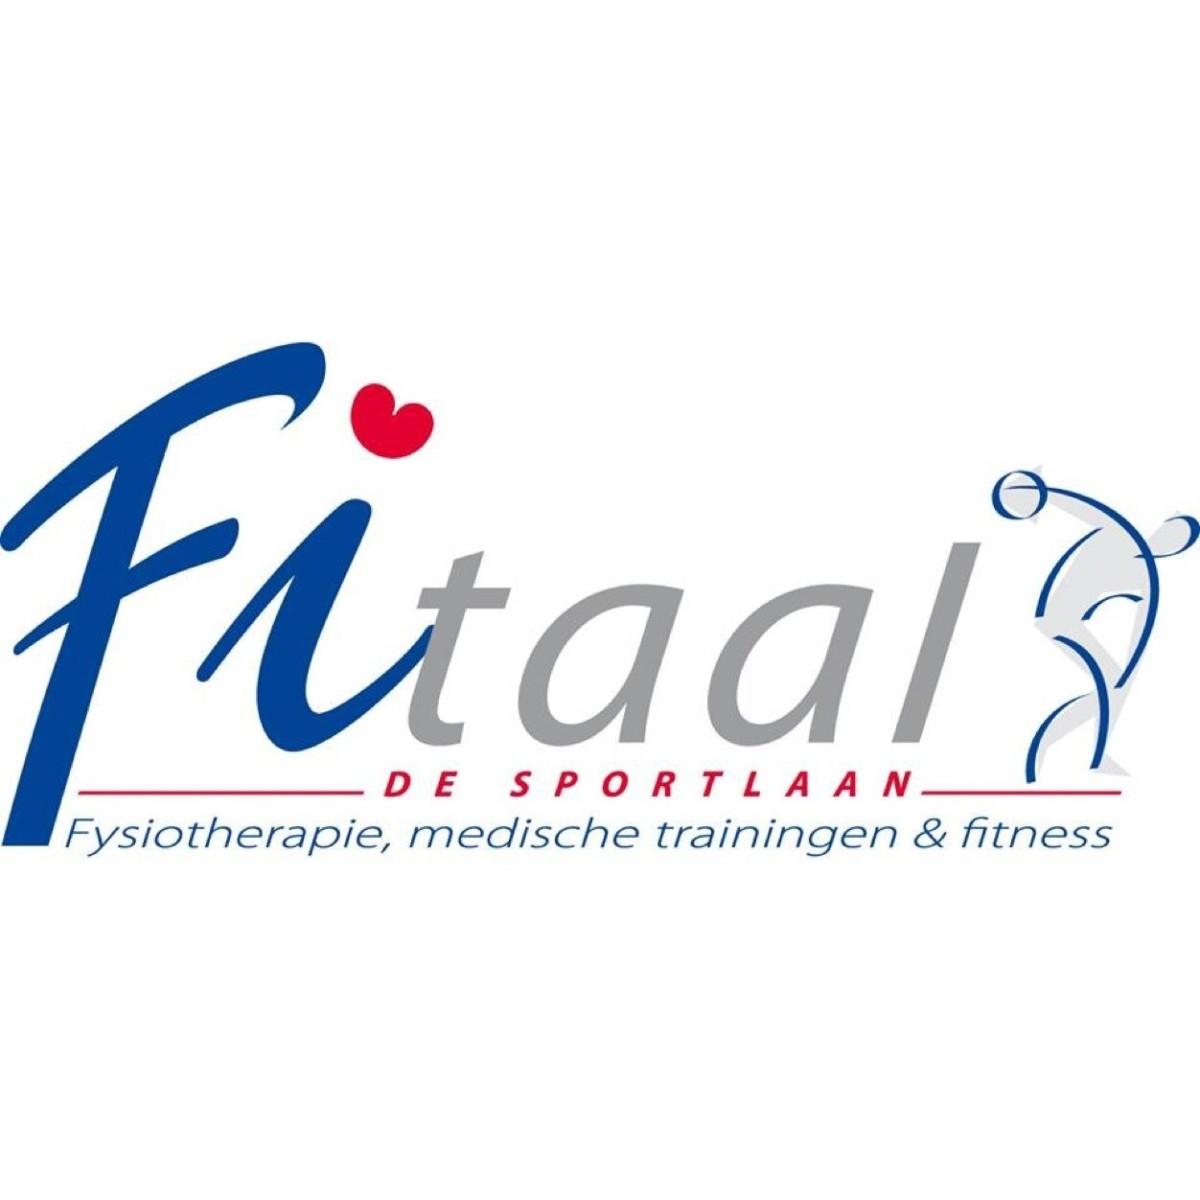 Sport Fitaal